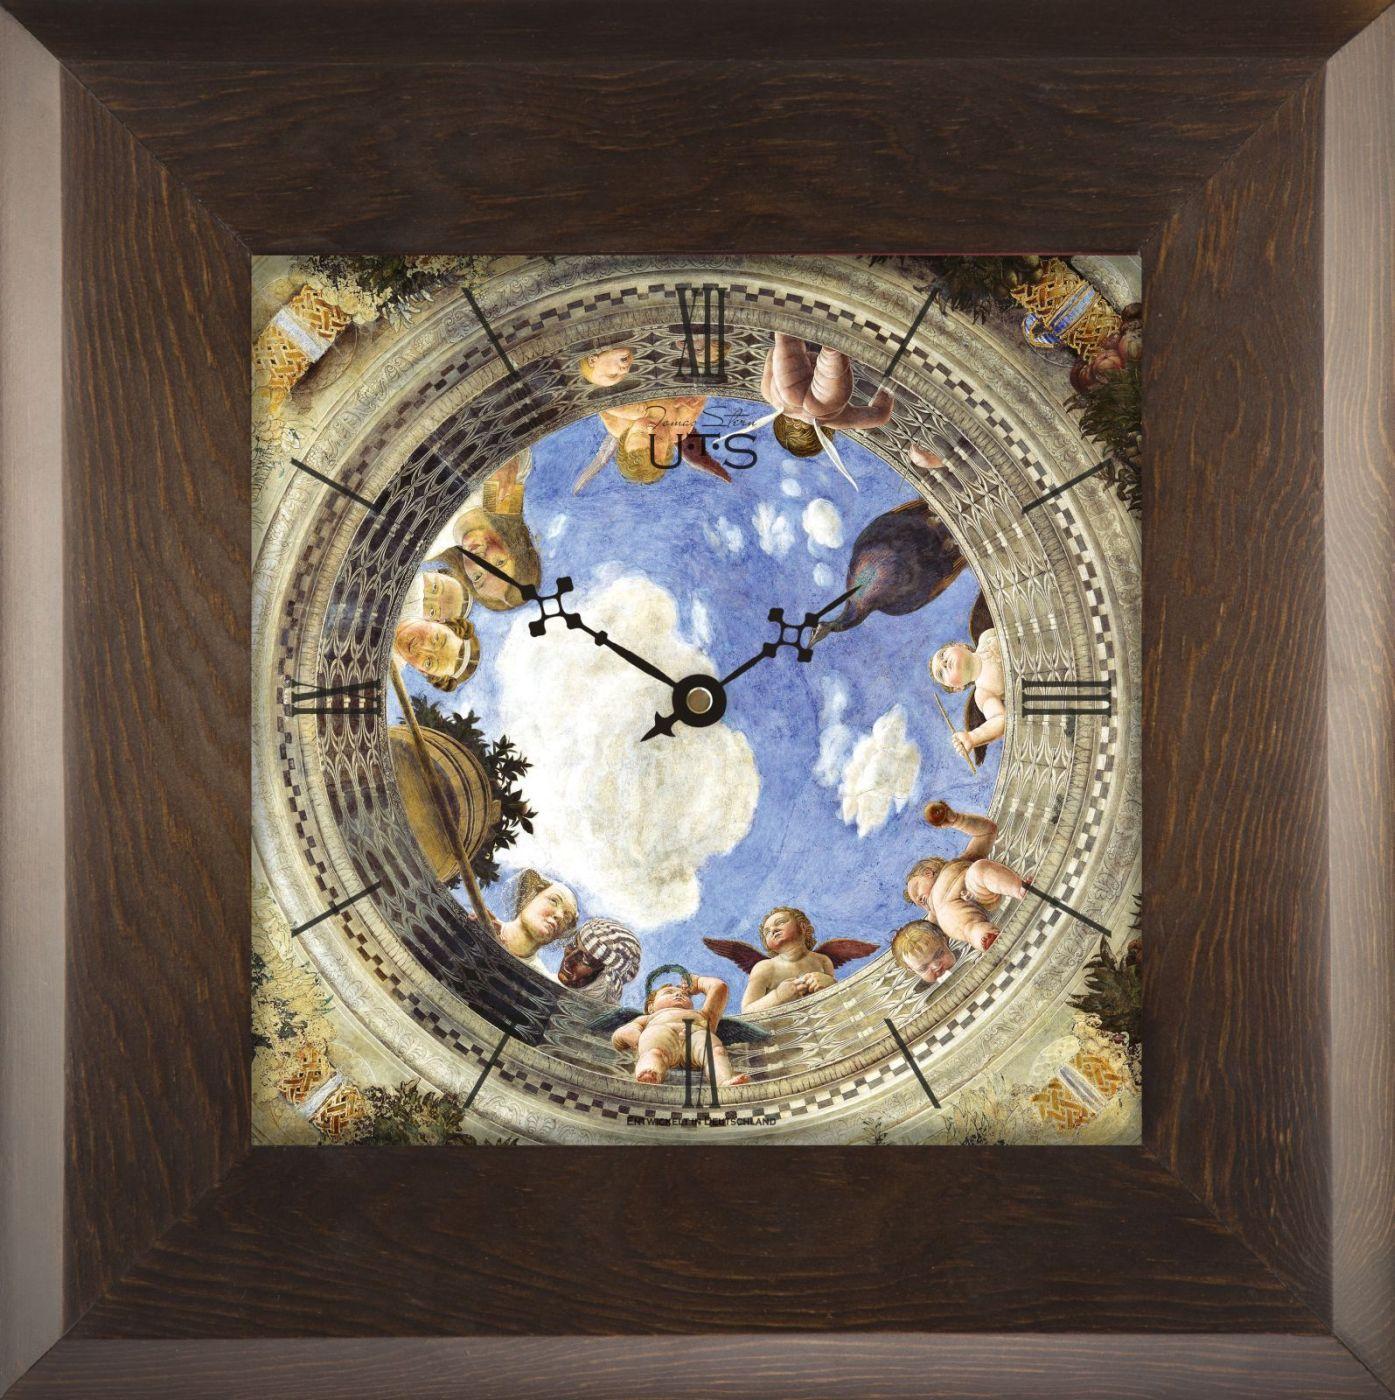 Часы настенные Часы настенные Tomas Stern 7005 chasy-nastennye-tomas-stern-7005-germaniya-tayvan.jpg